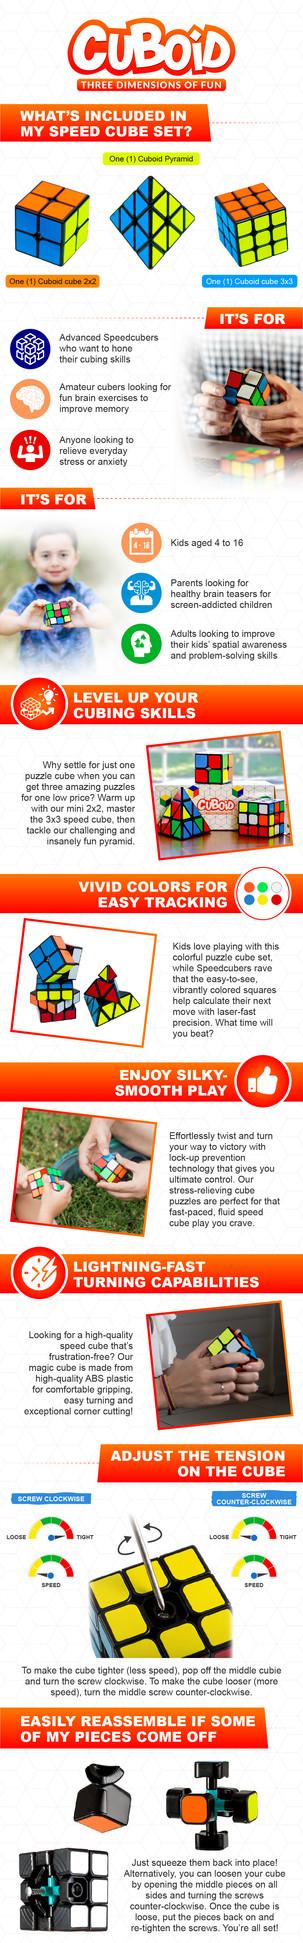 Cuboid Amazon Enhanced Brand Content